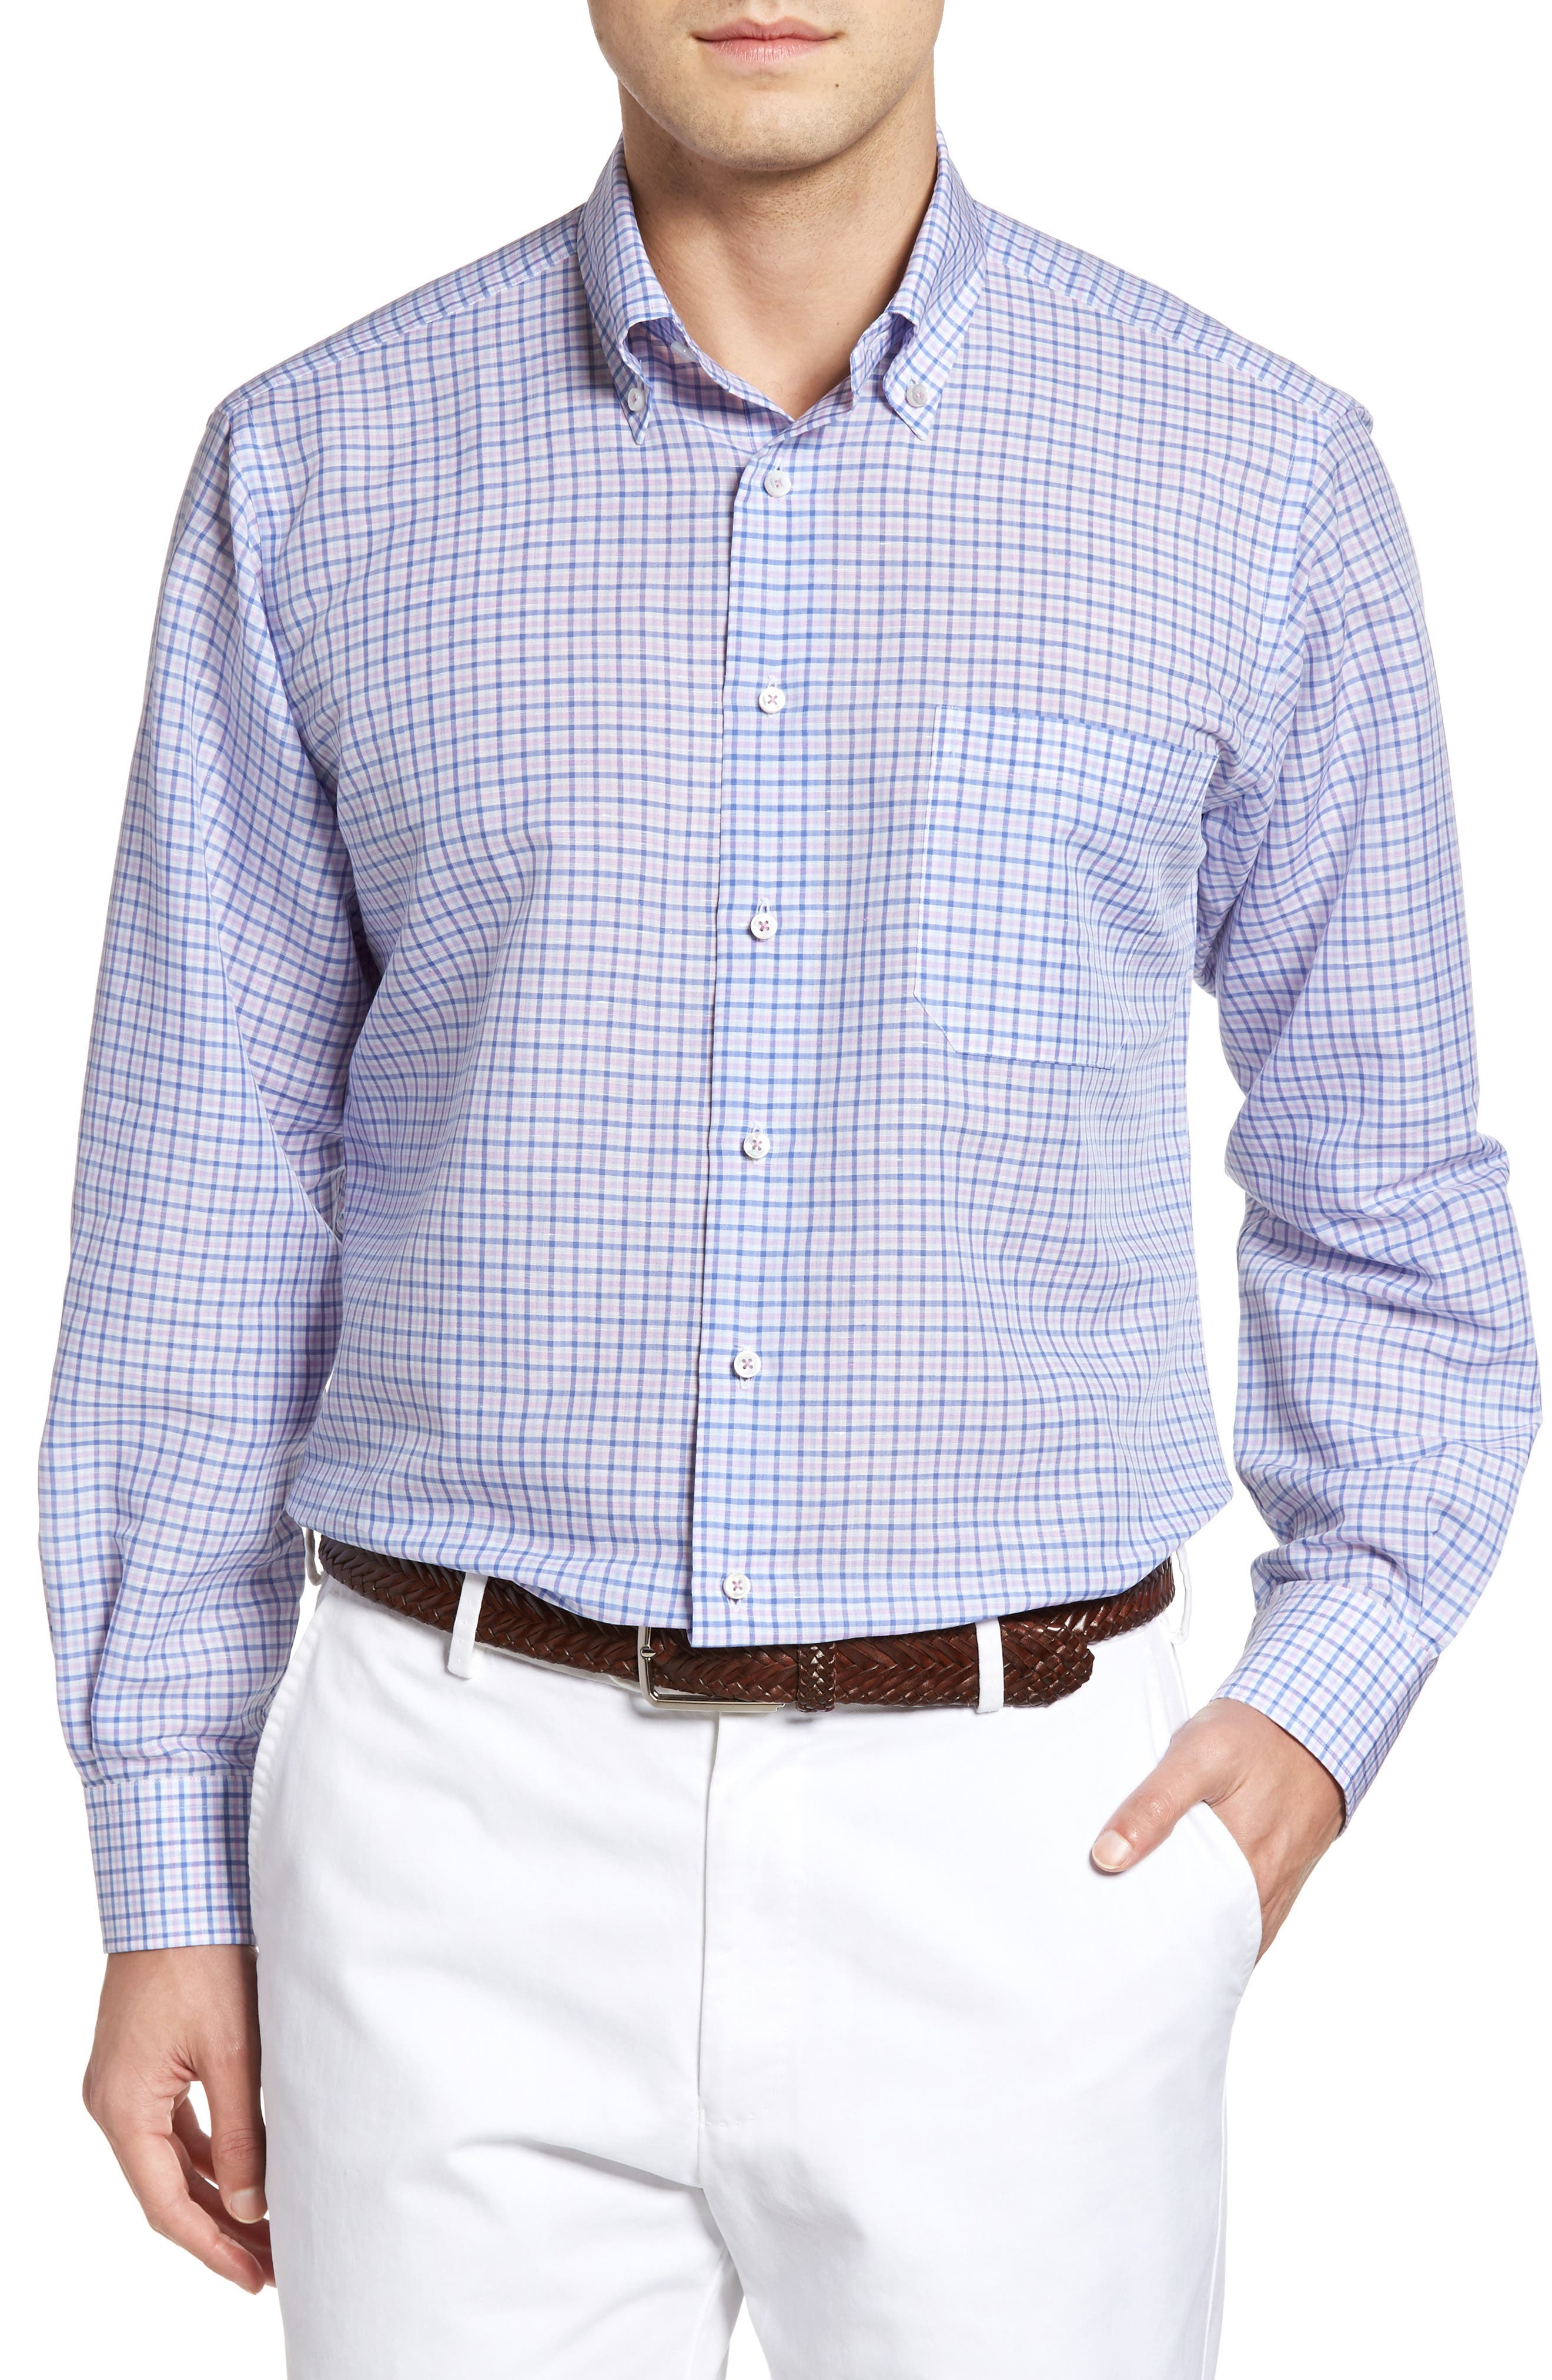 Main Image - Robert Talbott Estate Classic Fit Sport Shirt